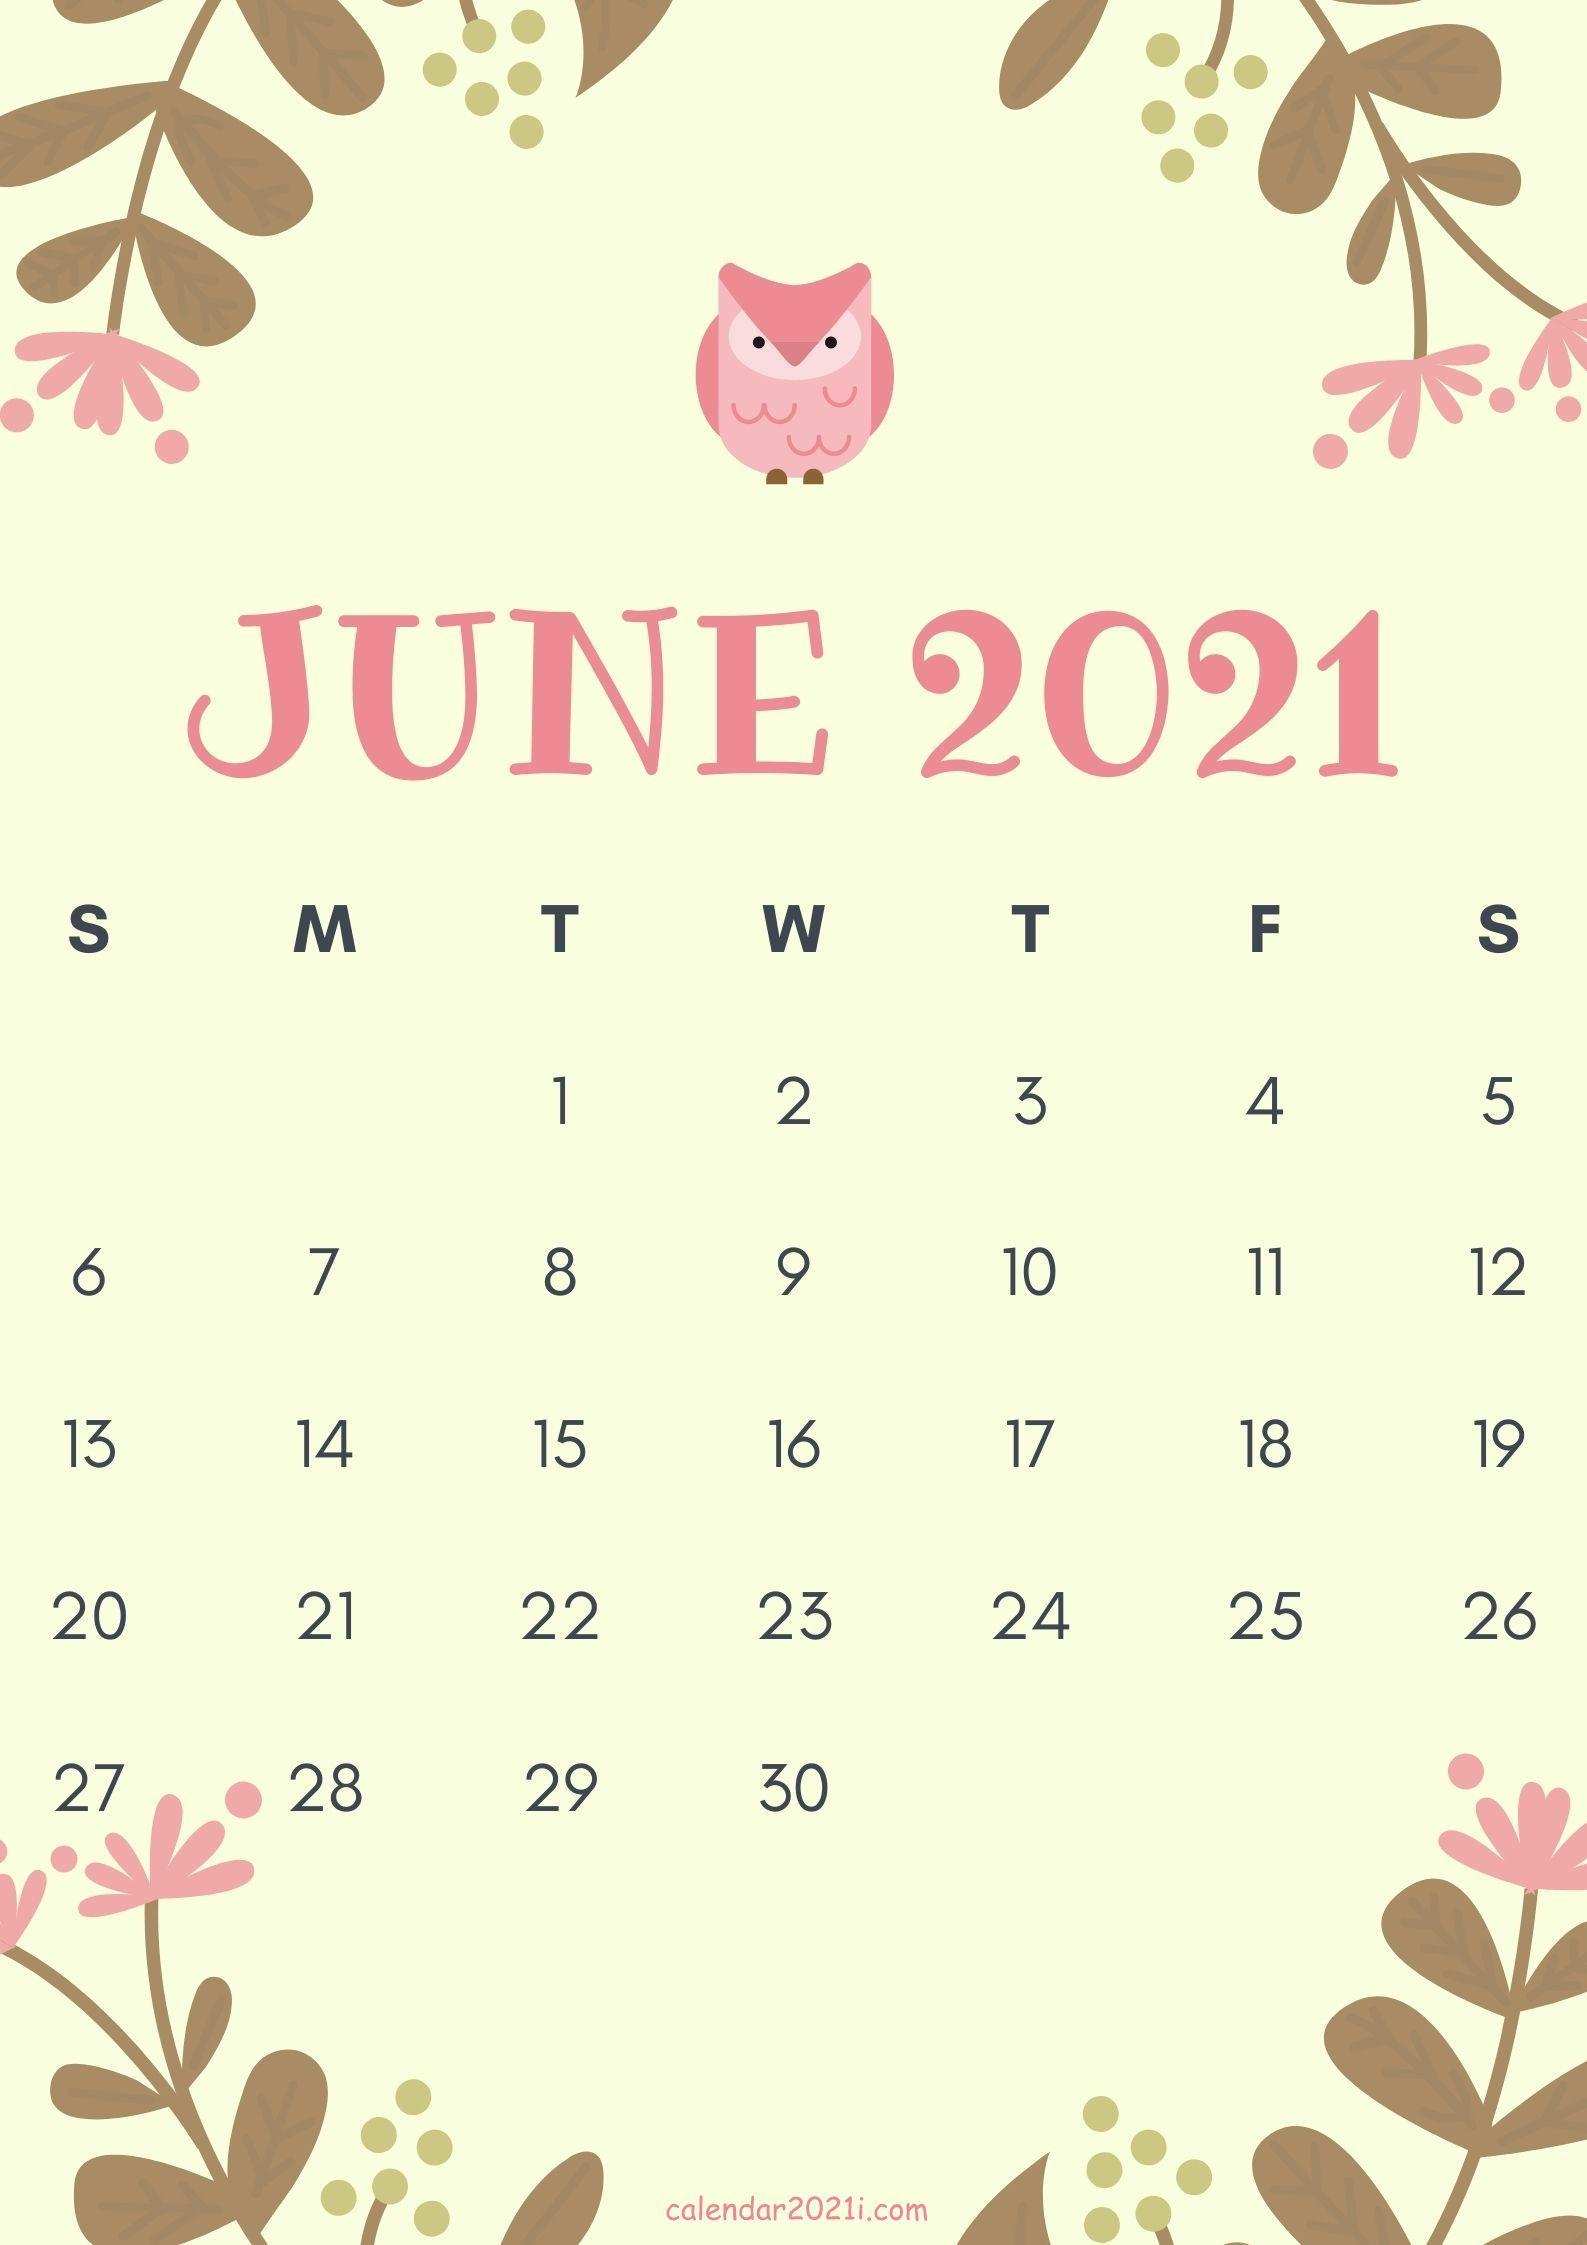 Cute June 2021 Calendar design theme layout download 1587x2245